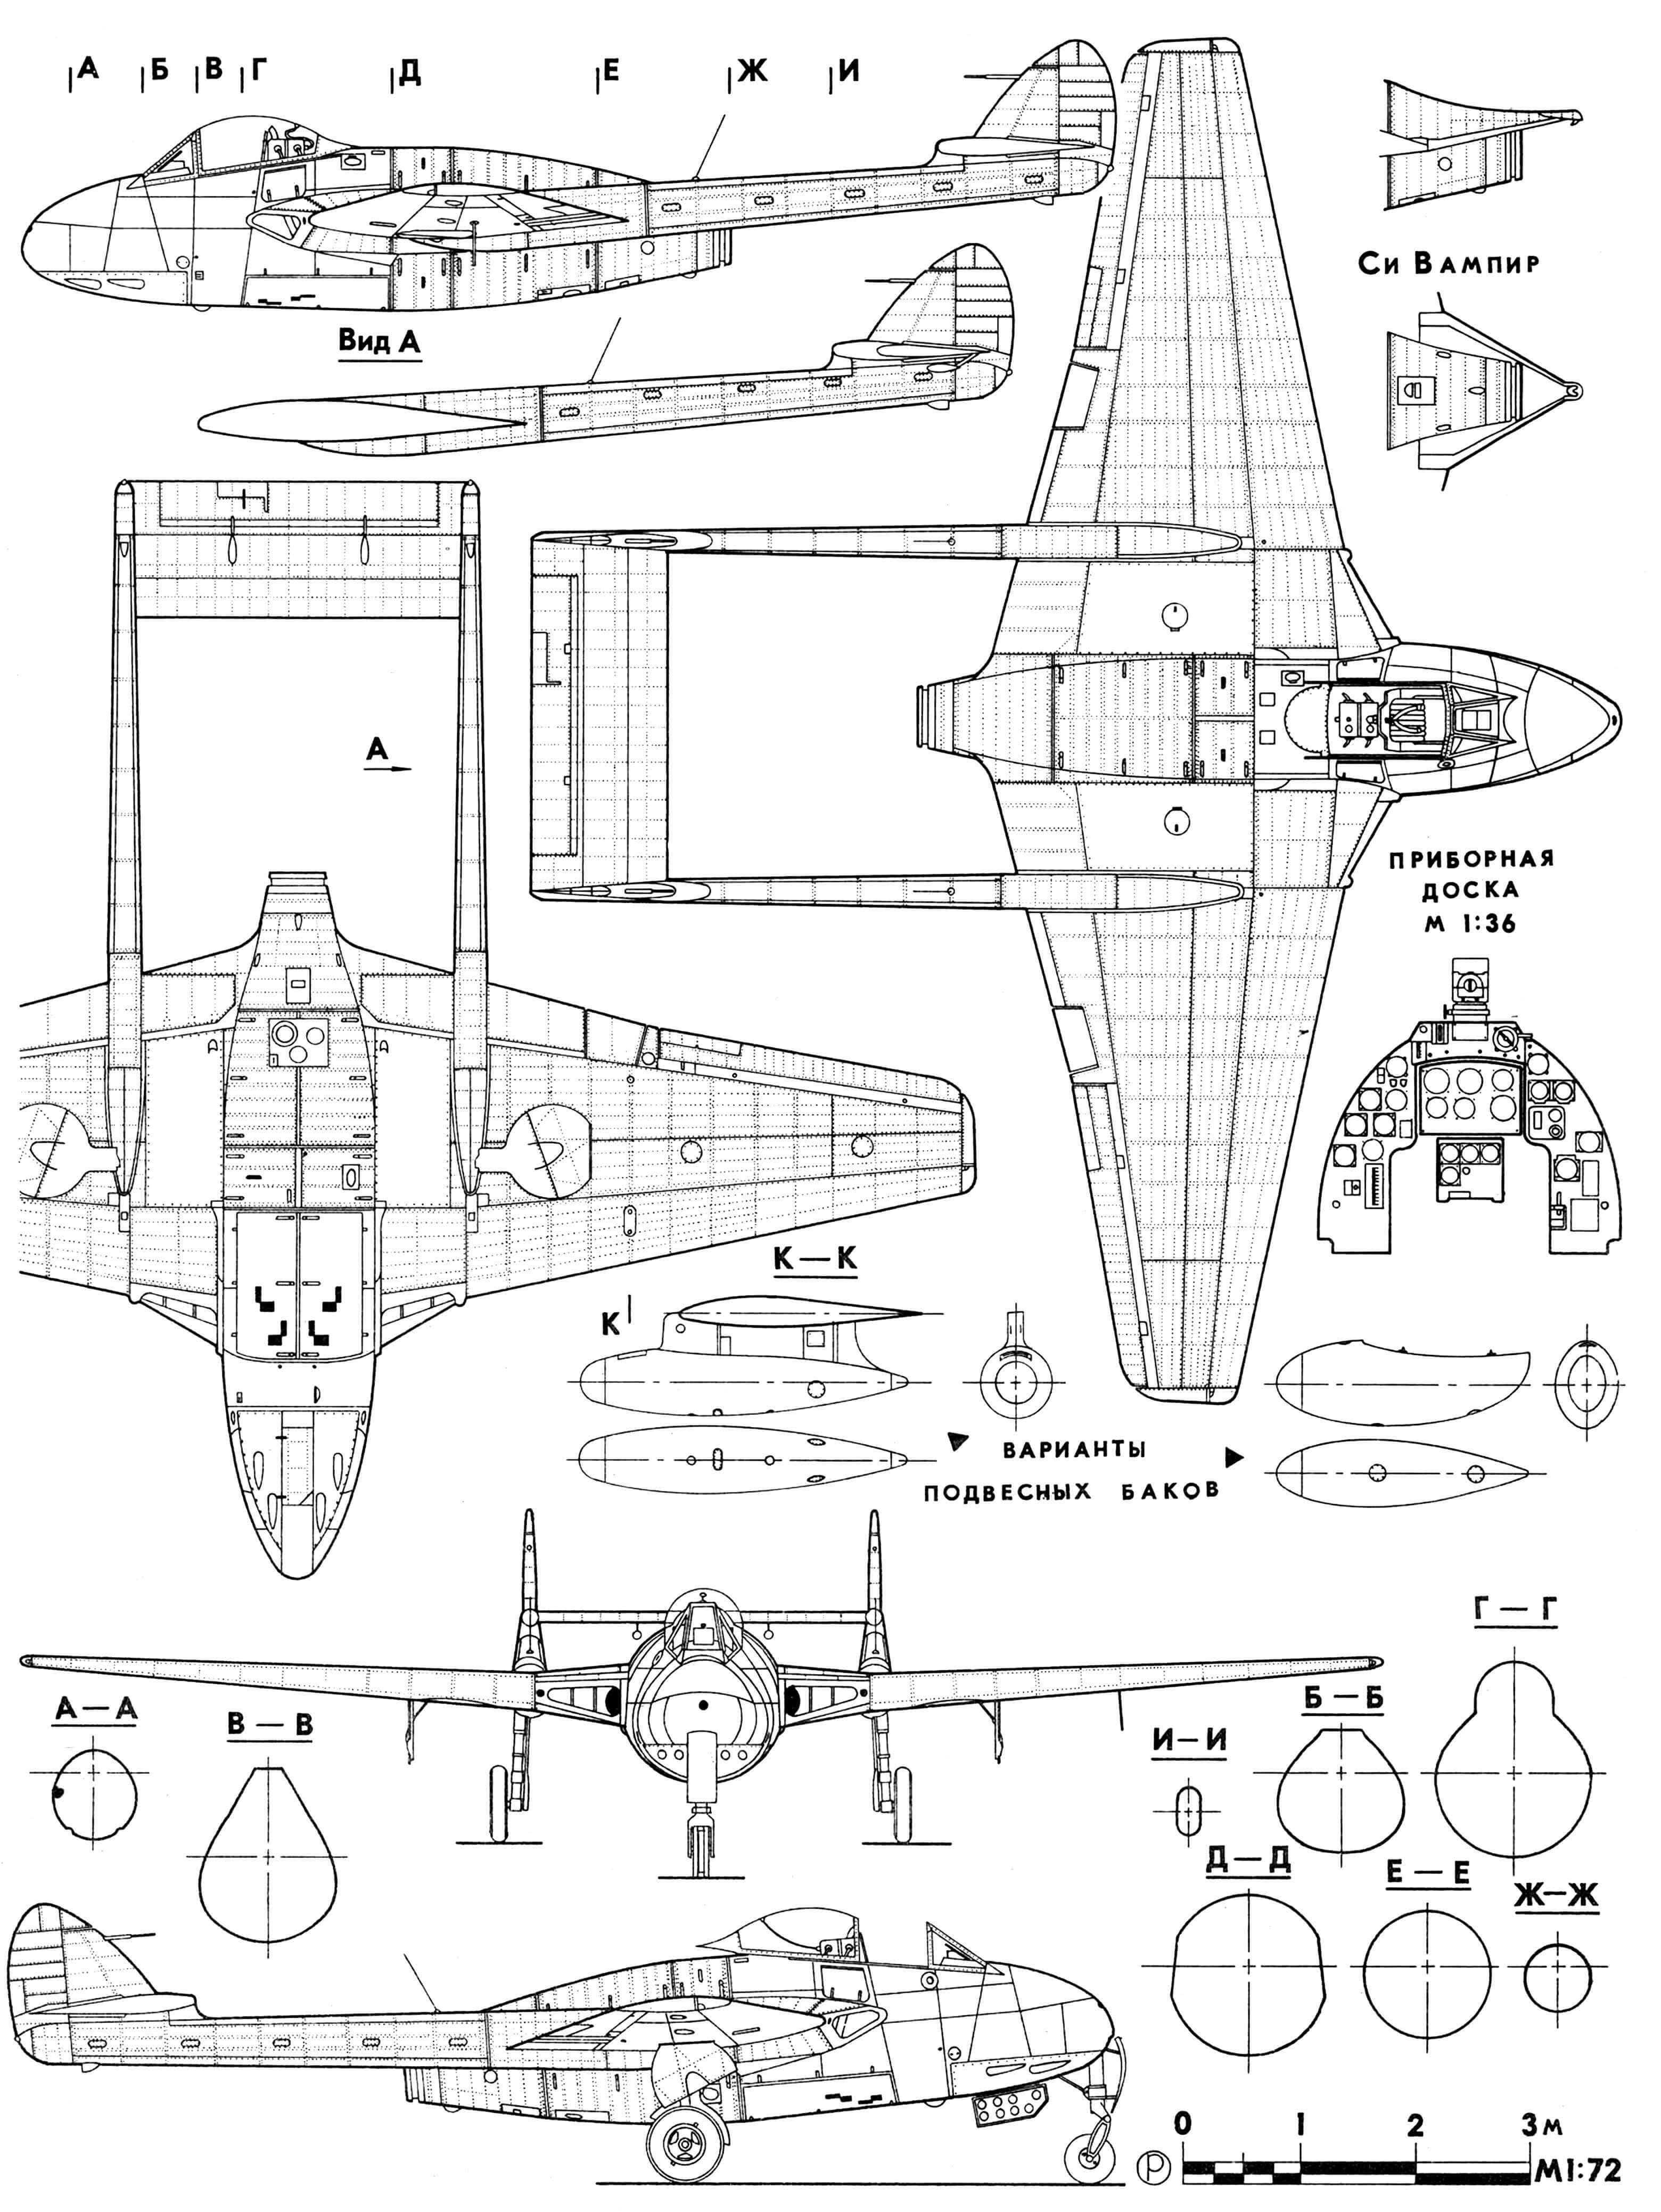 DH.100 VAMPIRE FВ. 5